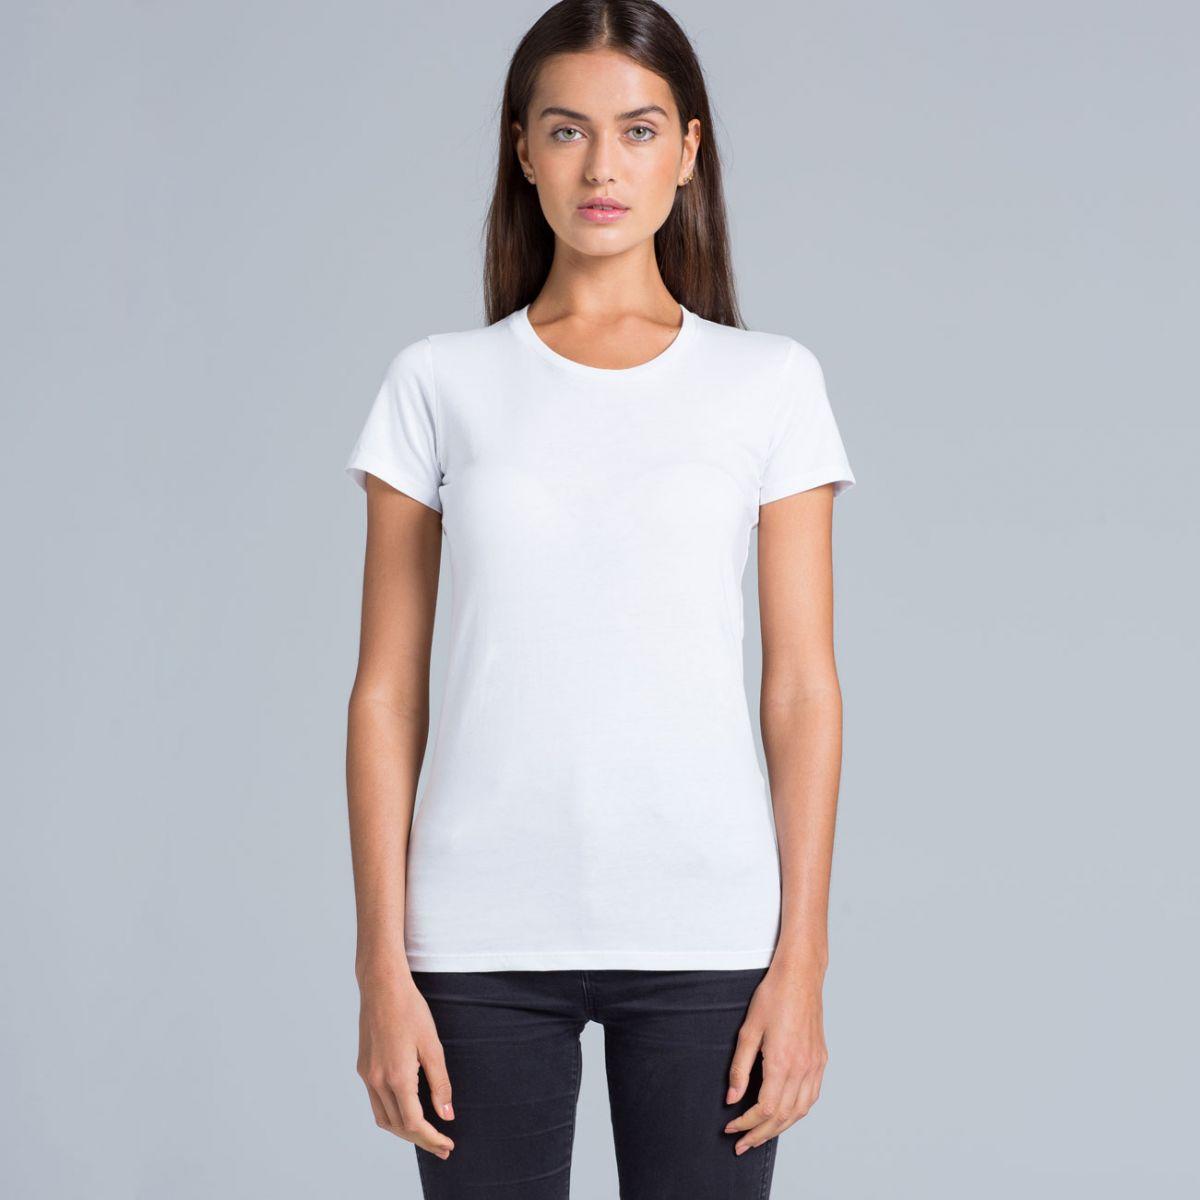 T shirt white colour - T Shirt White Colour 49